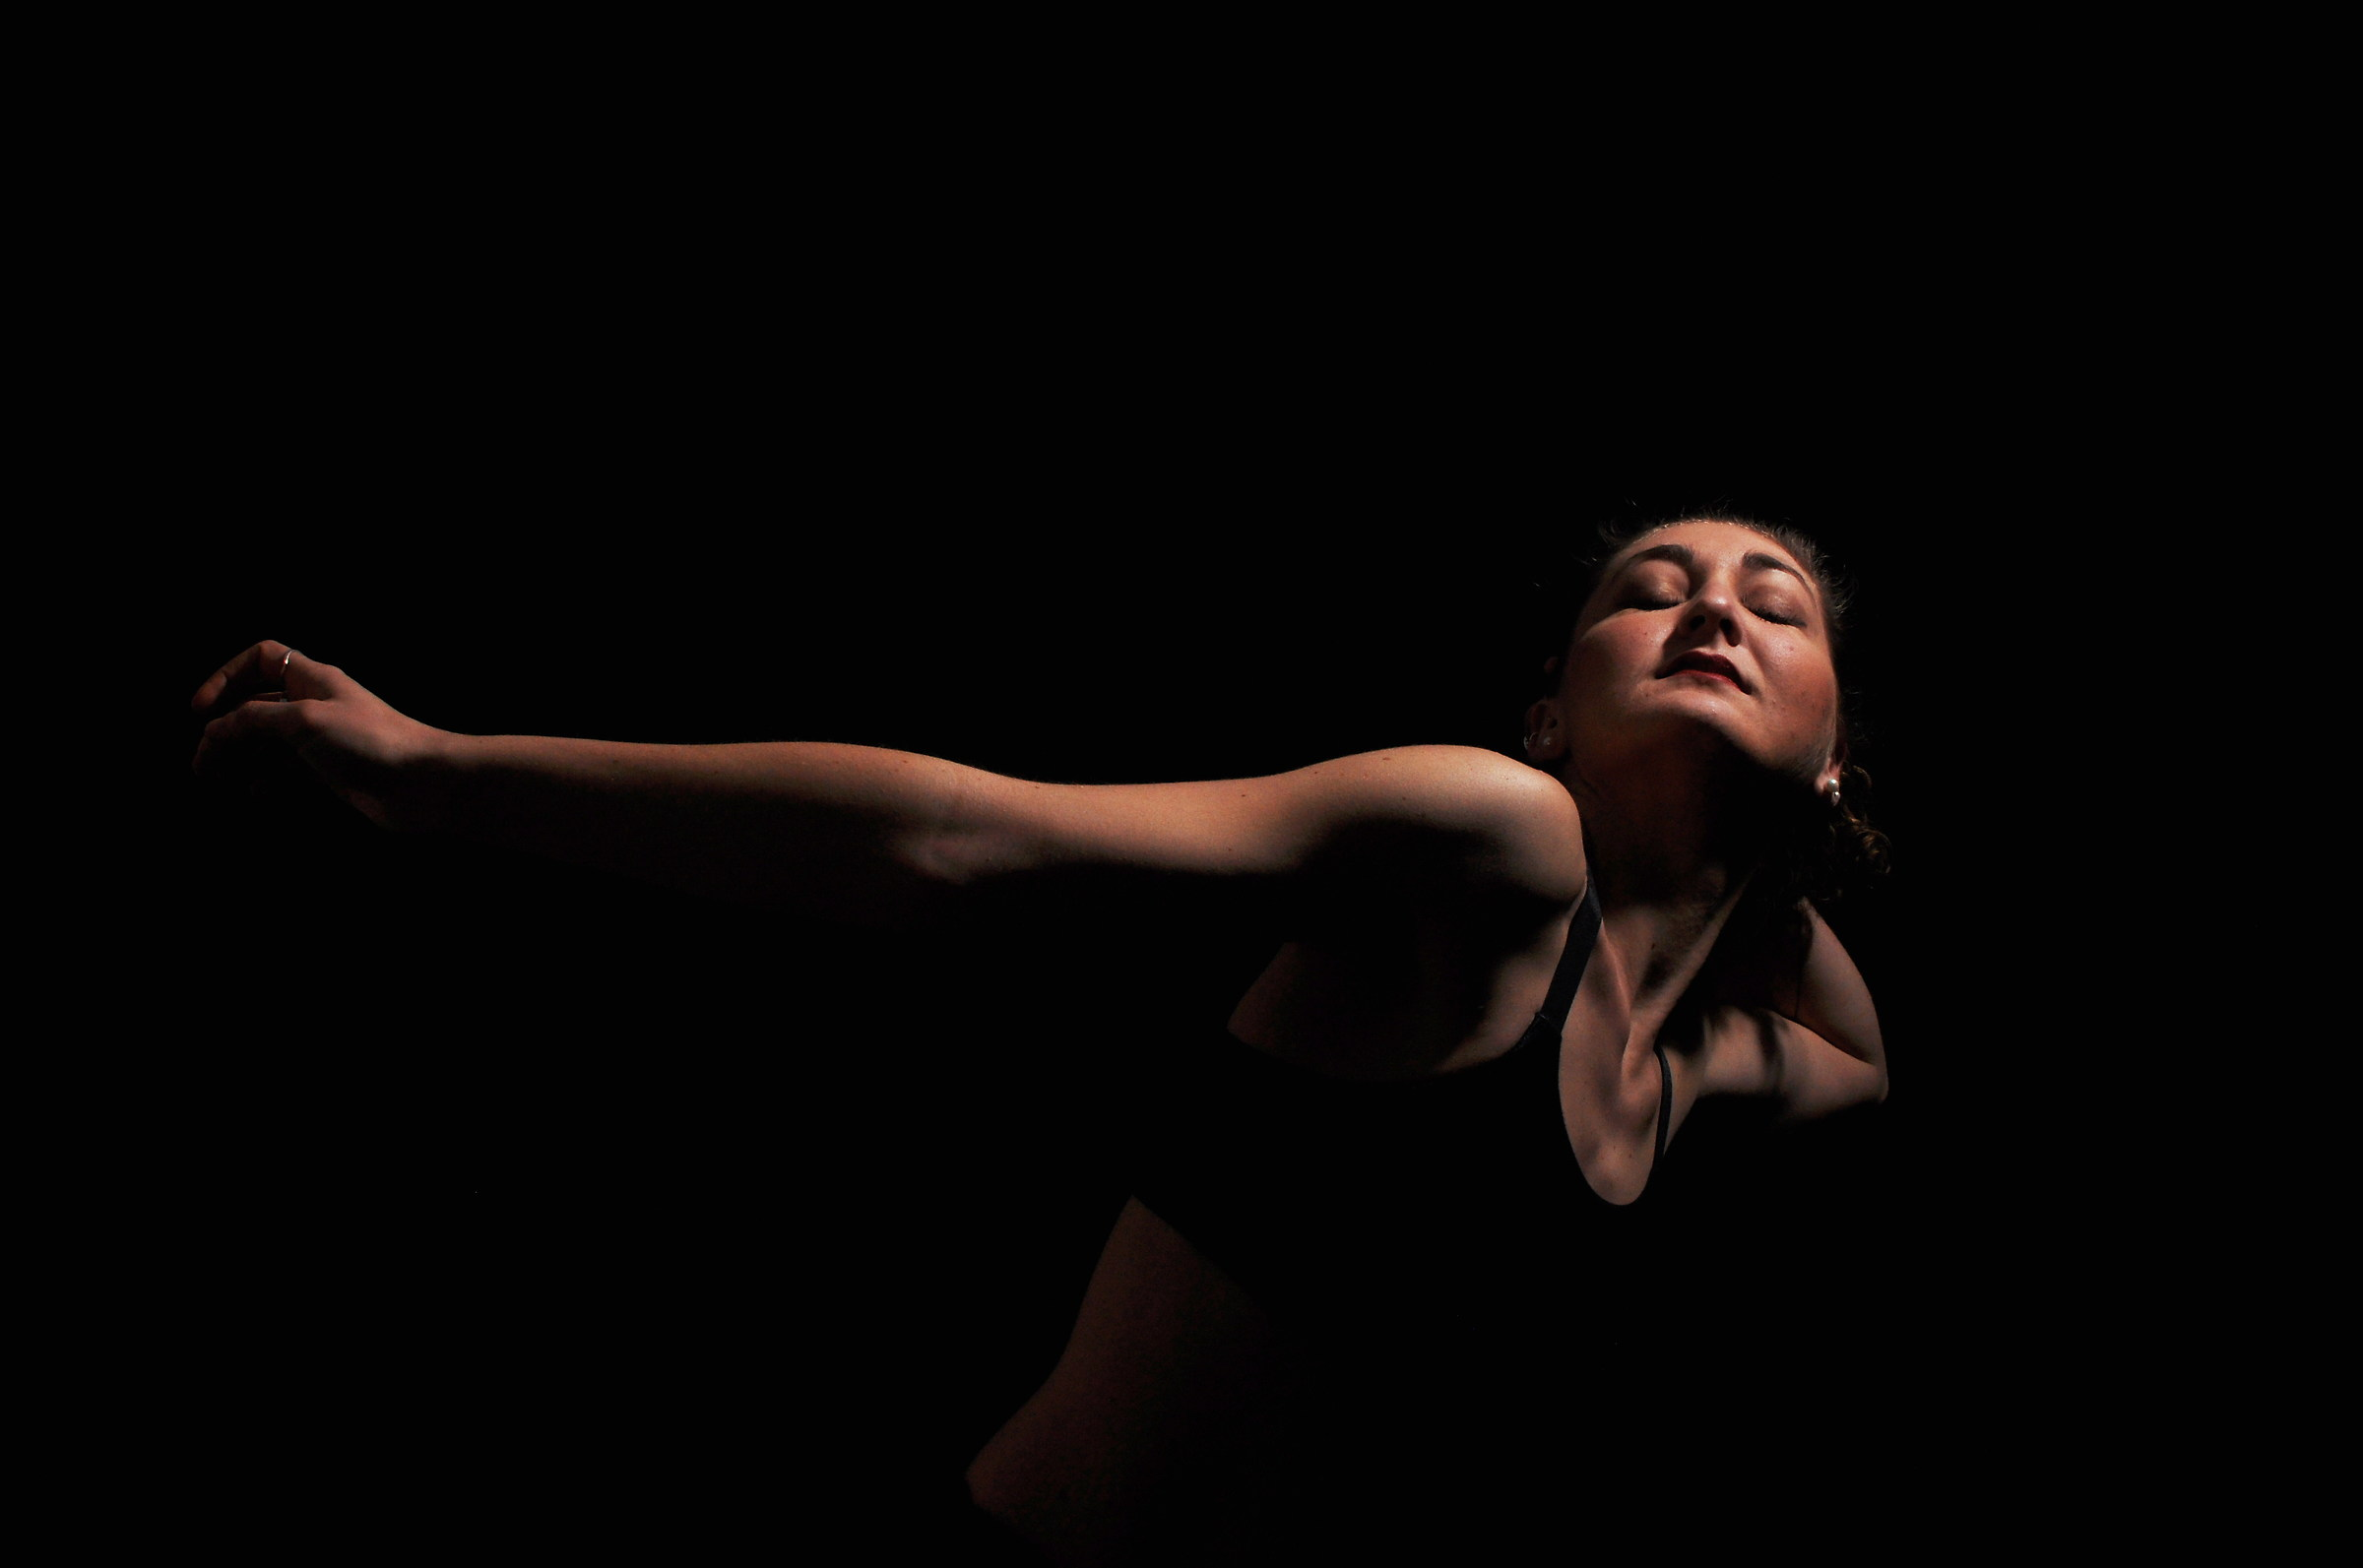 Dancing in the dark...